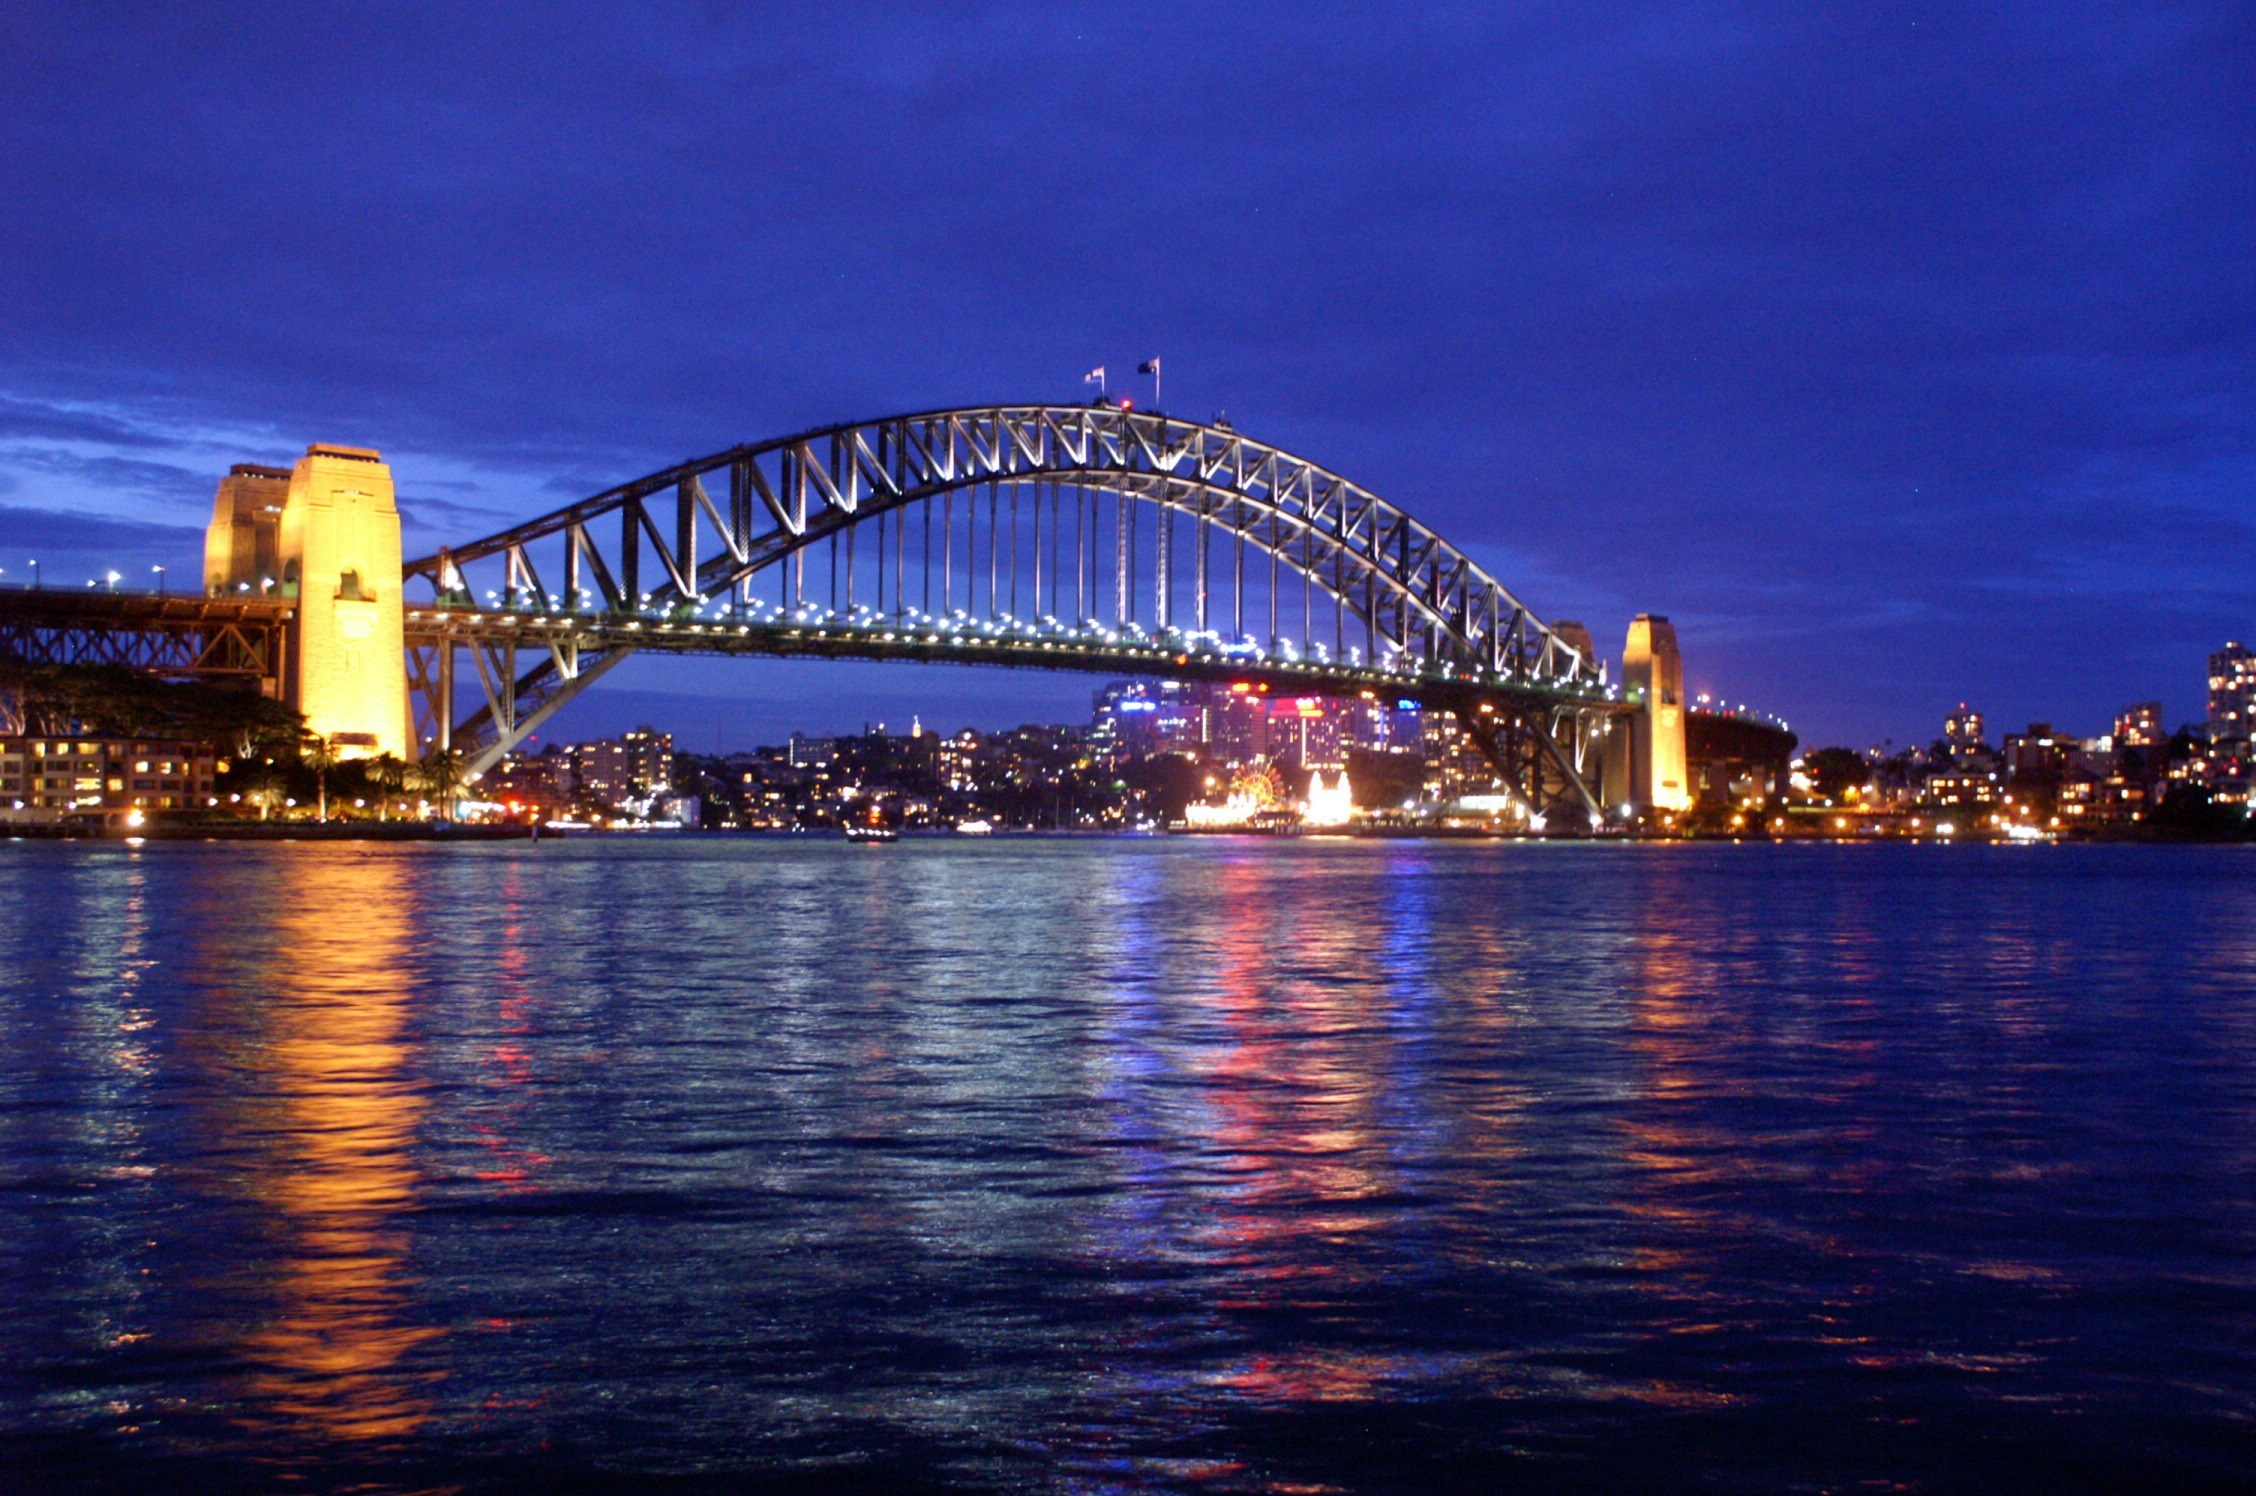 Sydney Harbour Bridge in the Twilight